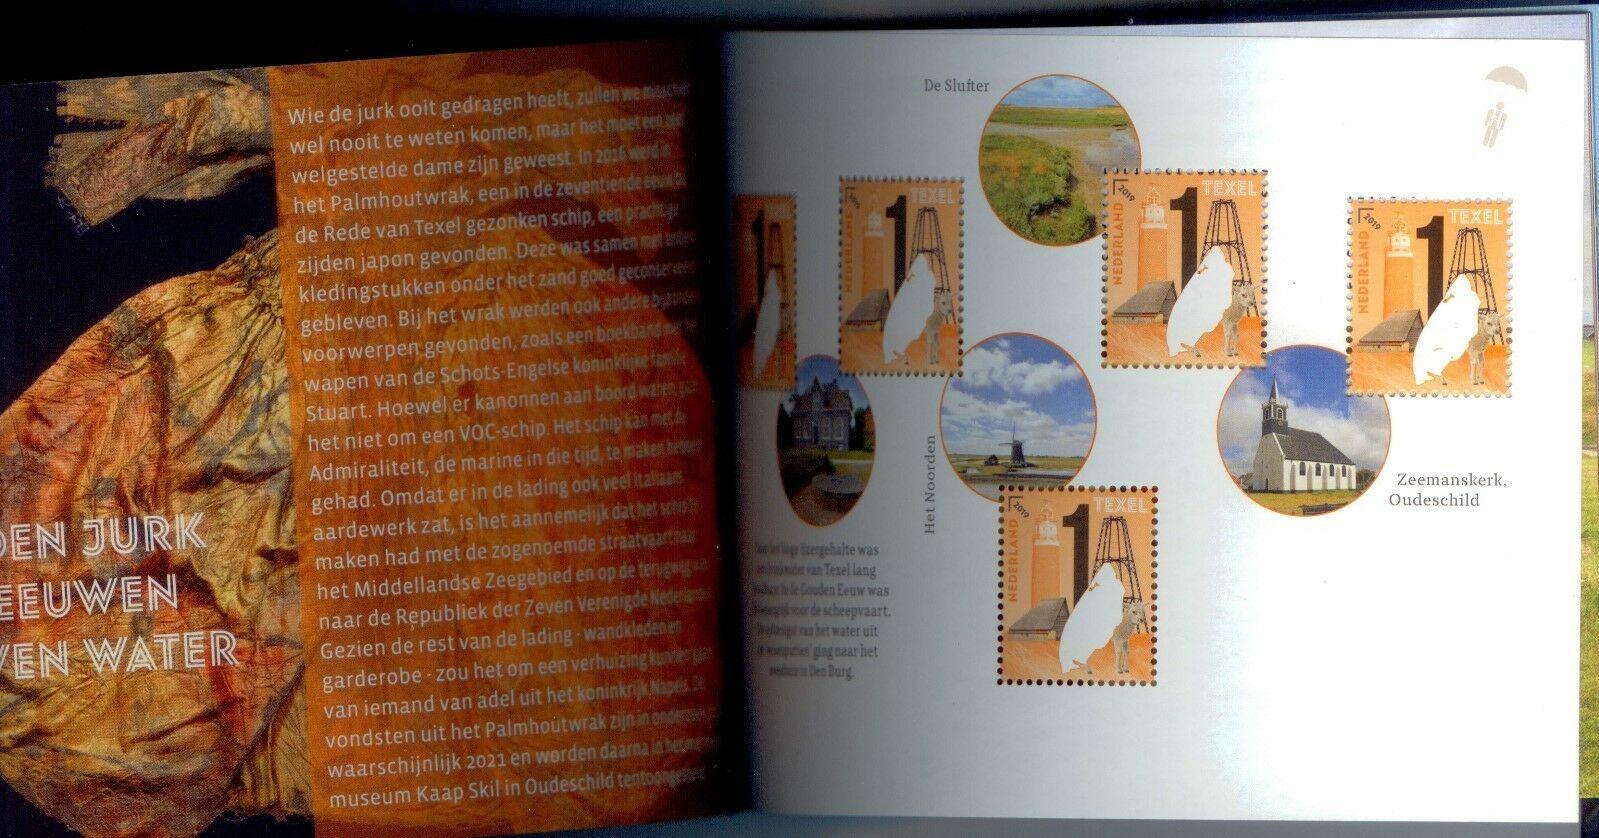 Netherlands - Beautiful Netherlands: Texel (January 2, 2019) prestige booklet